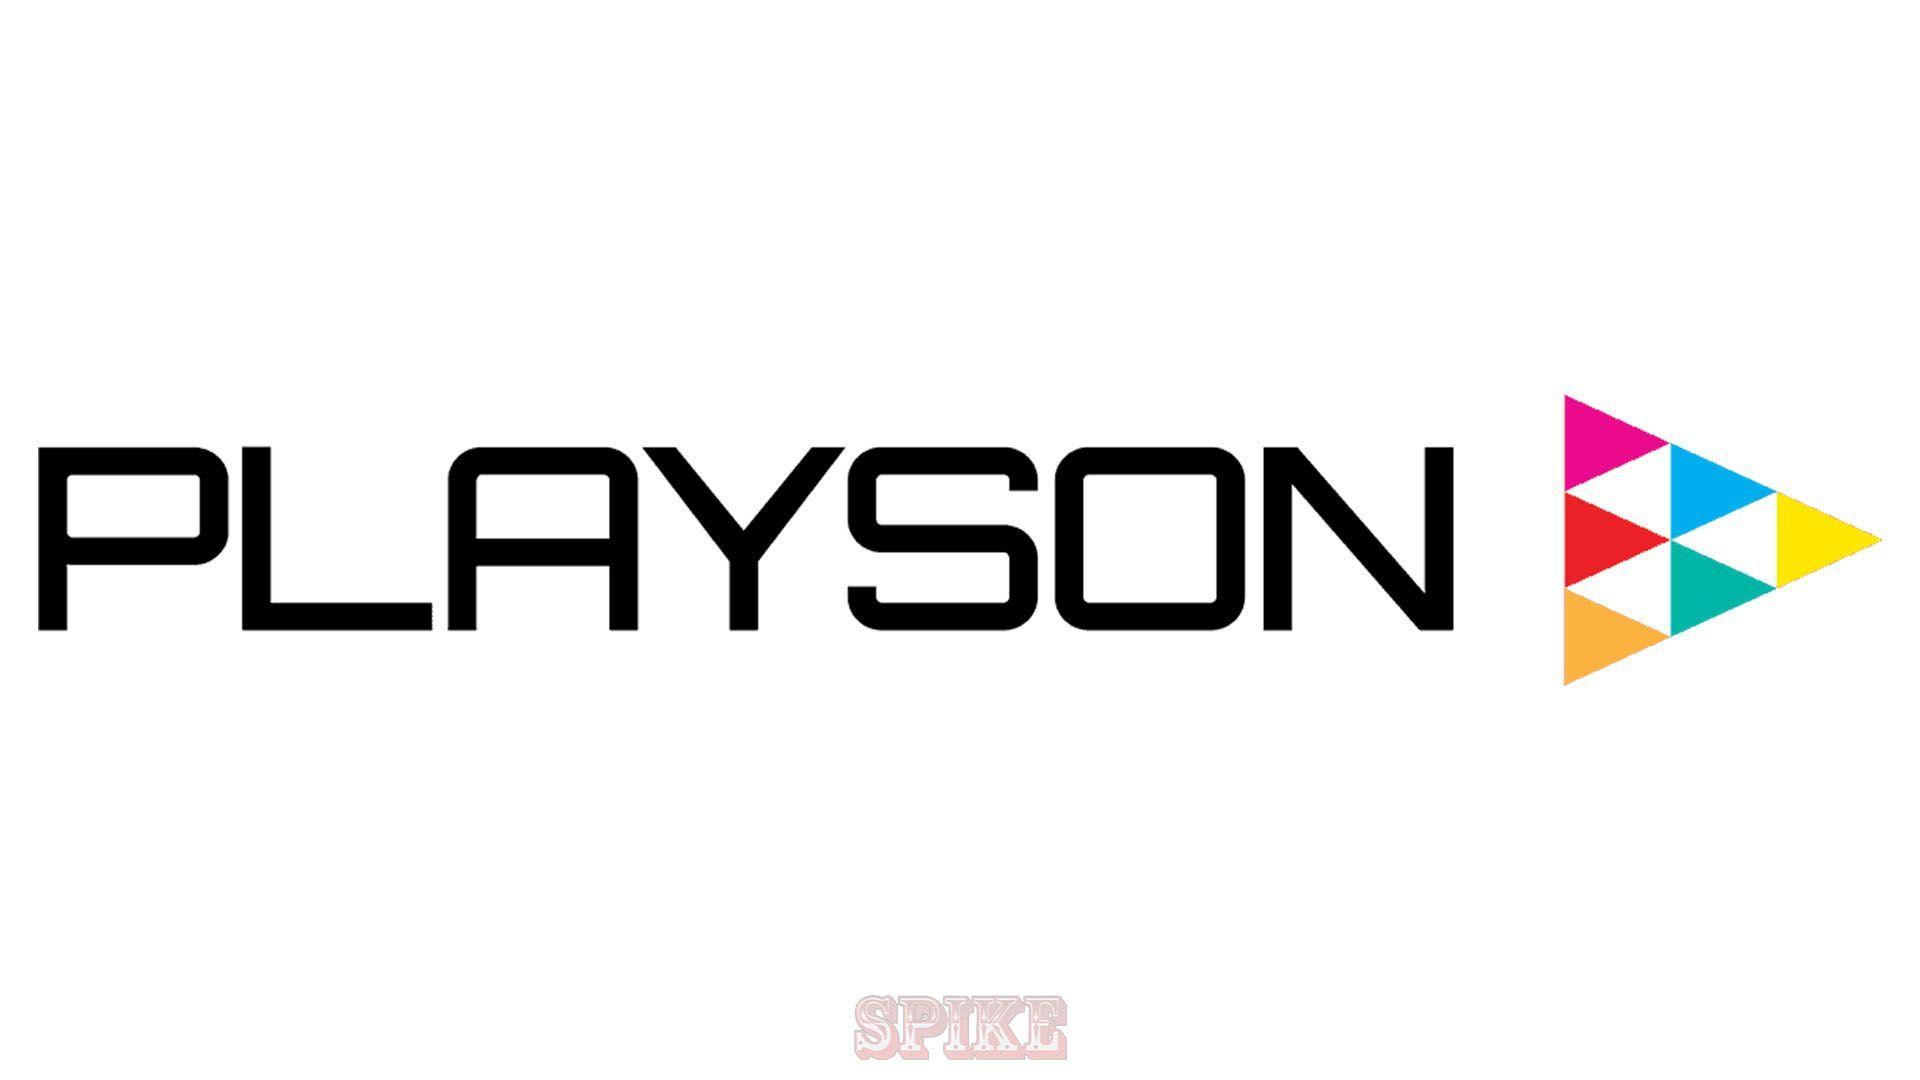 playson-producer-producer-logo